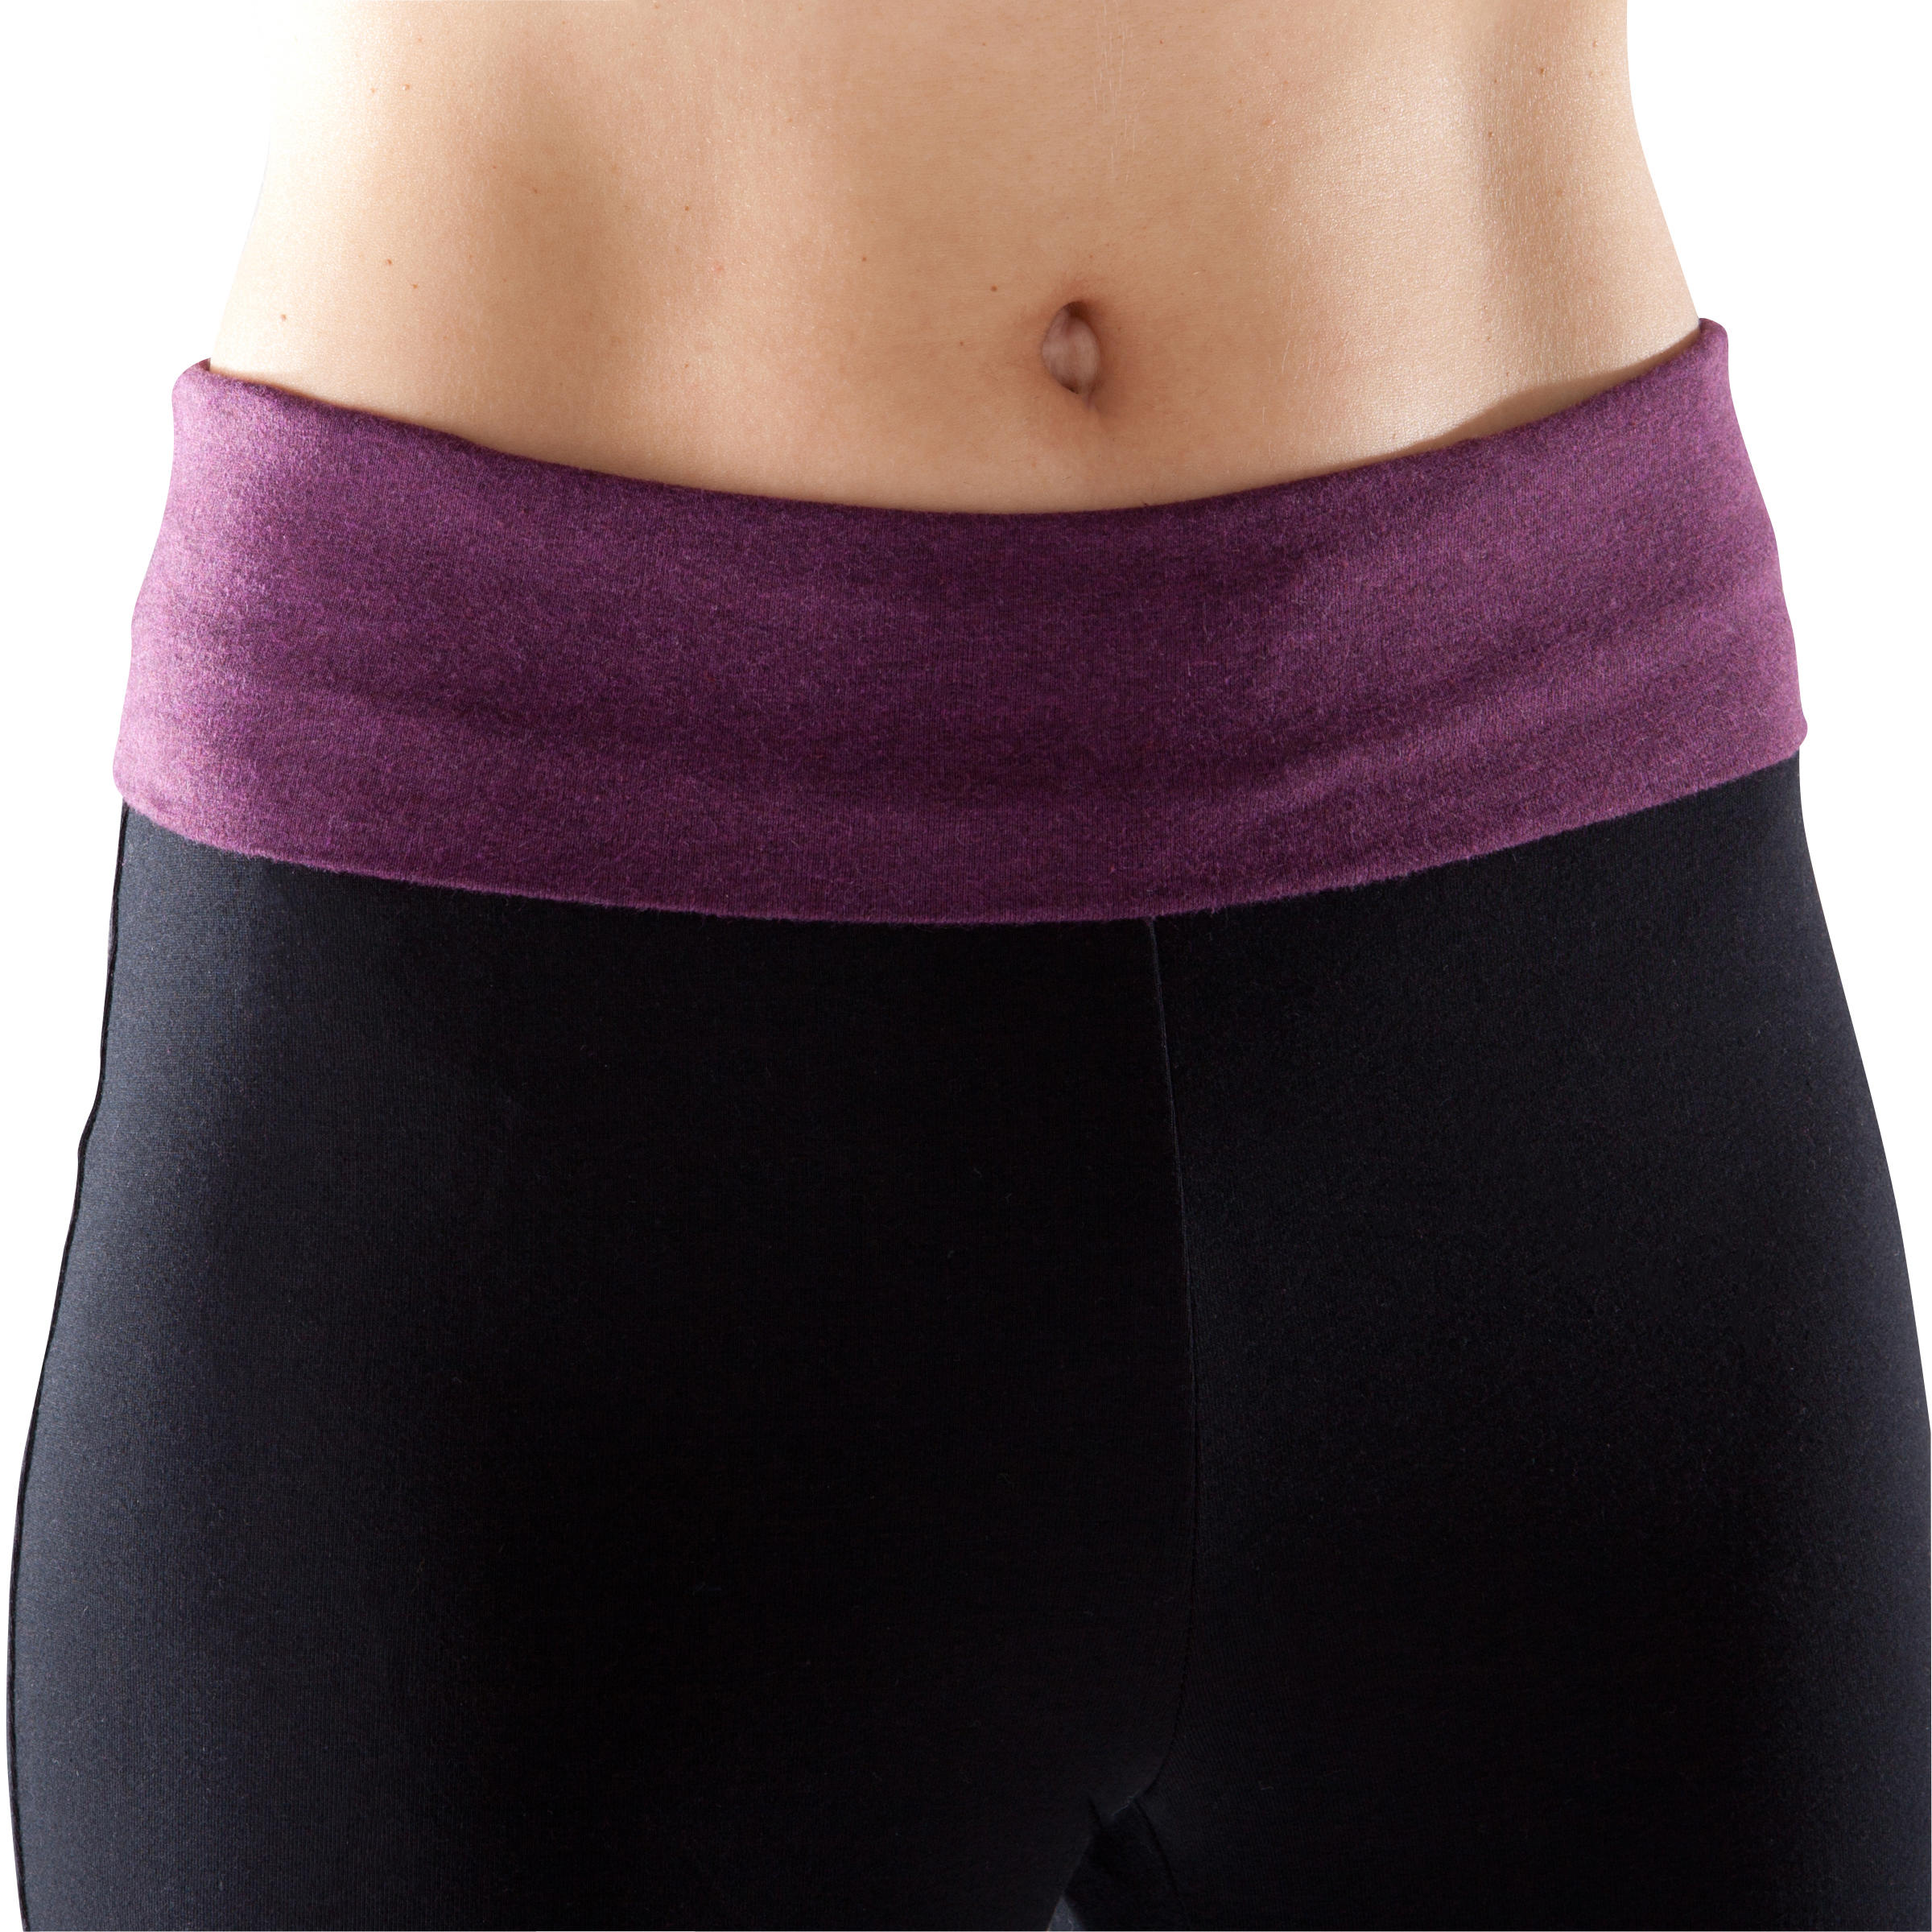 Women's Organic Cotton Gentle Yoga Cropped Bottoms - Black/Heathered Burgundy